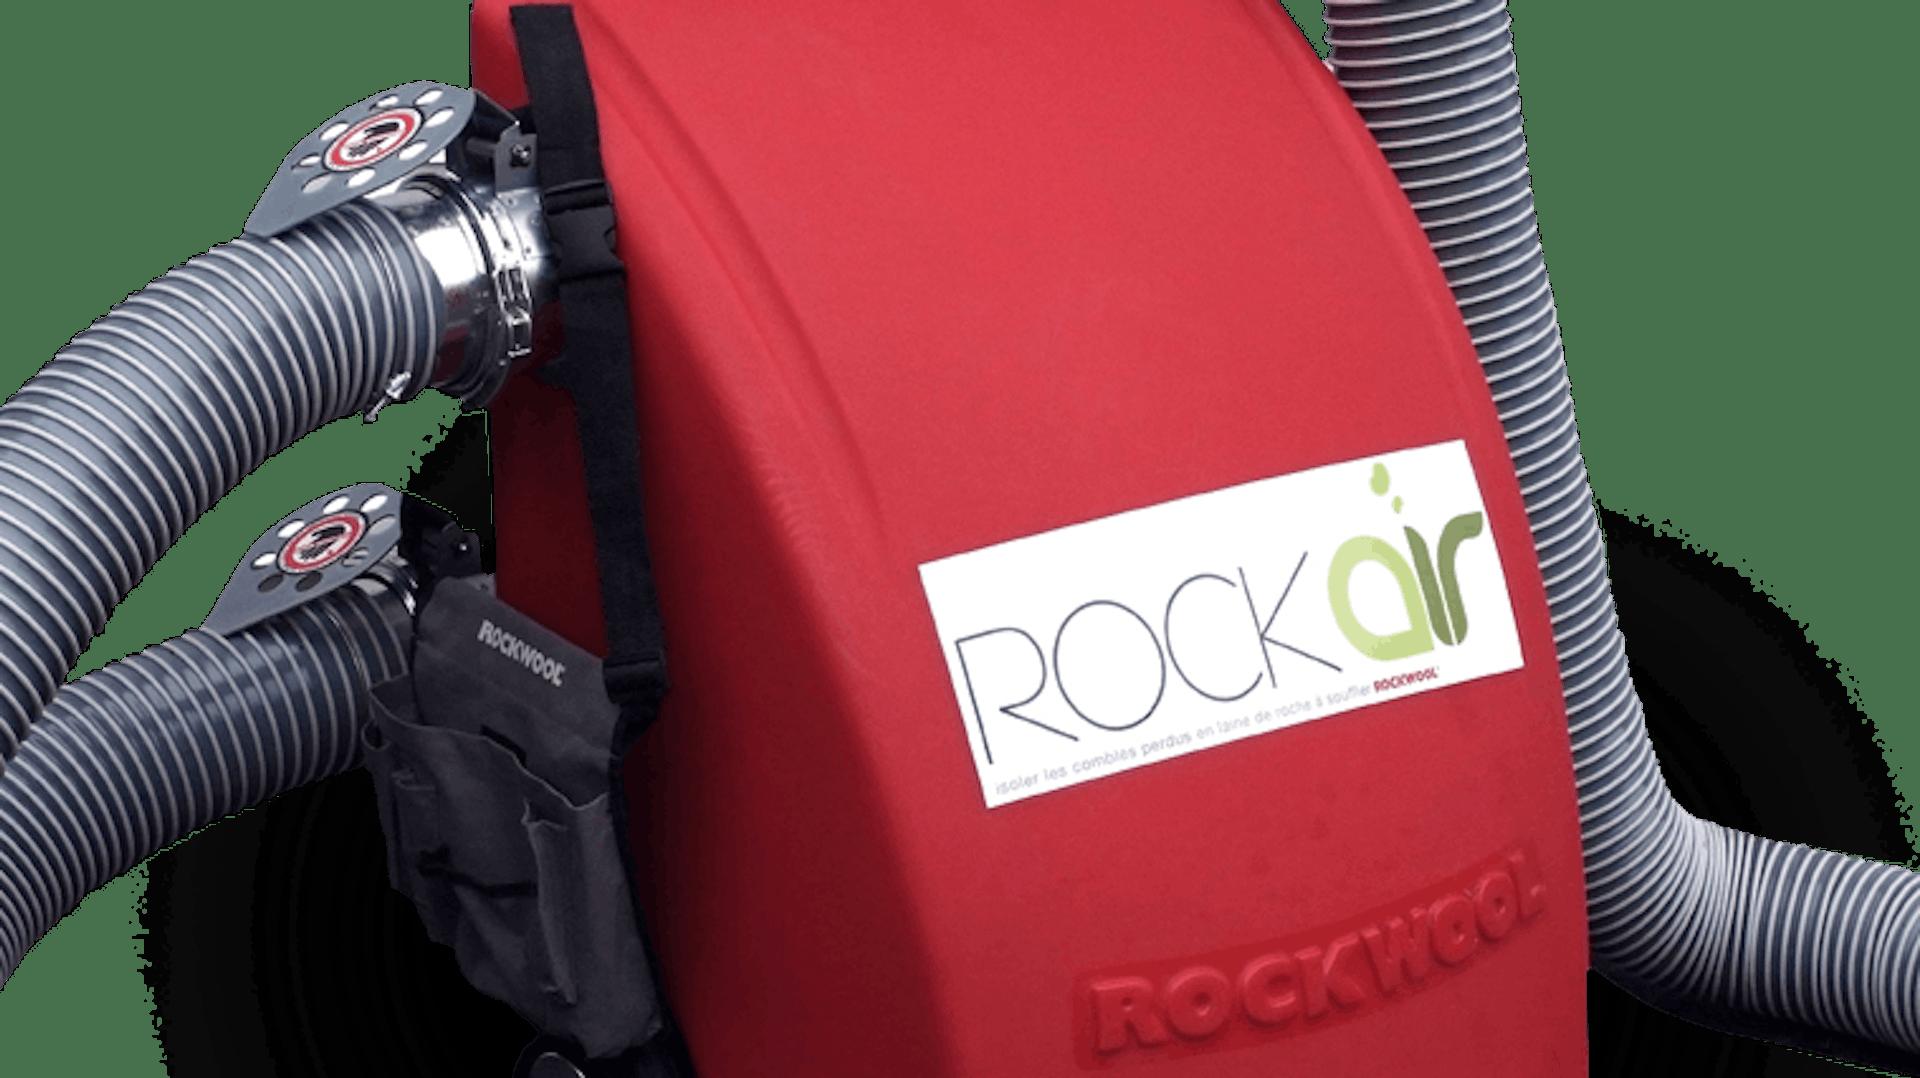 ROCKAIR_Machine à souffler